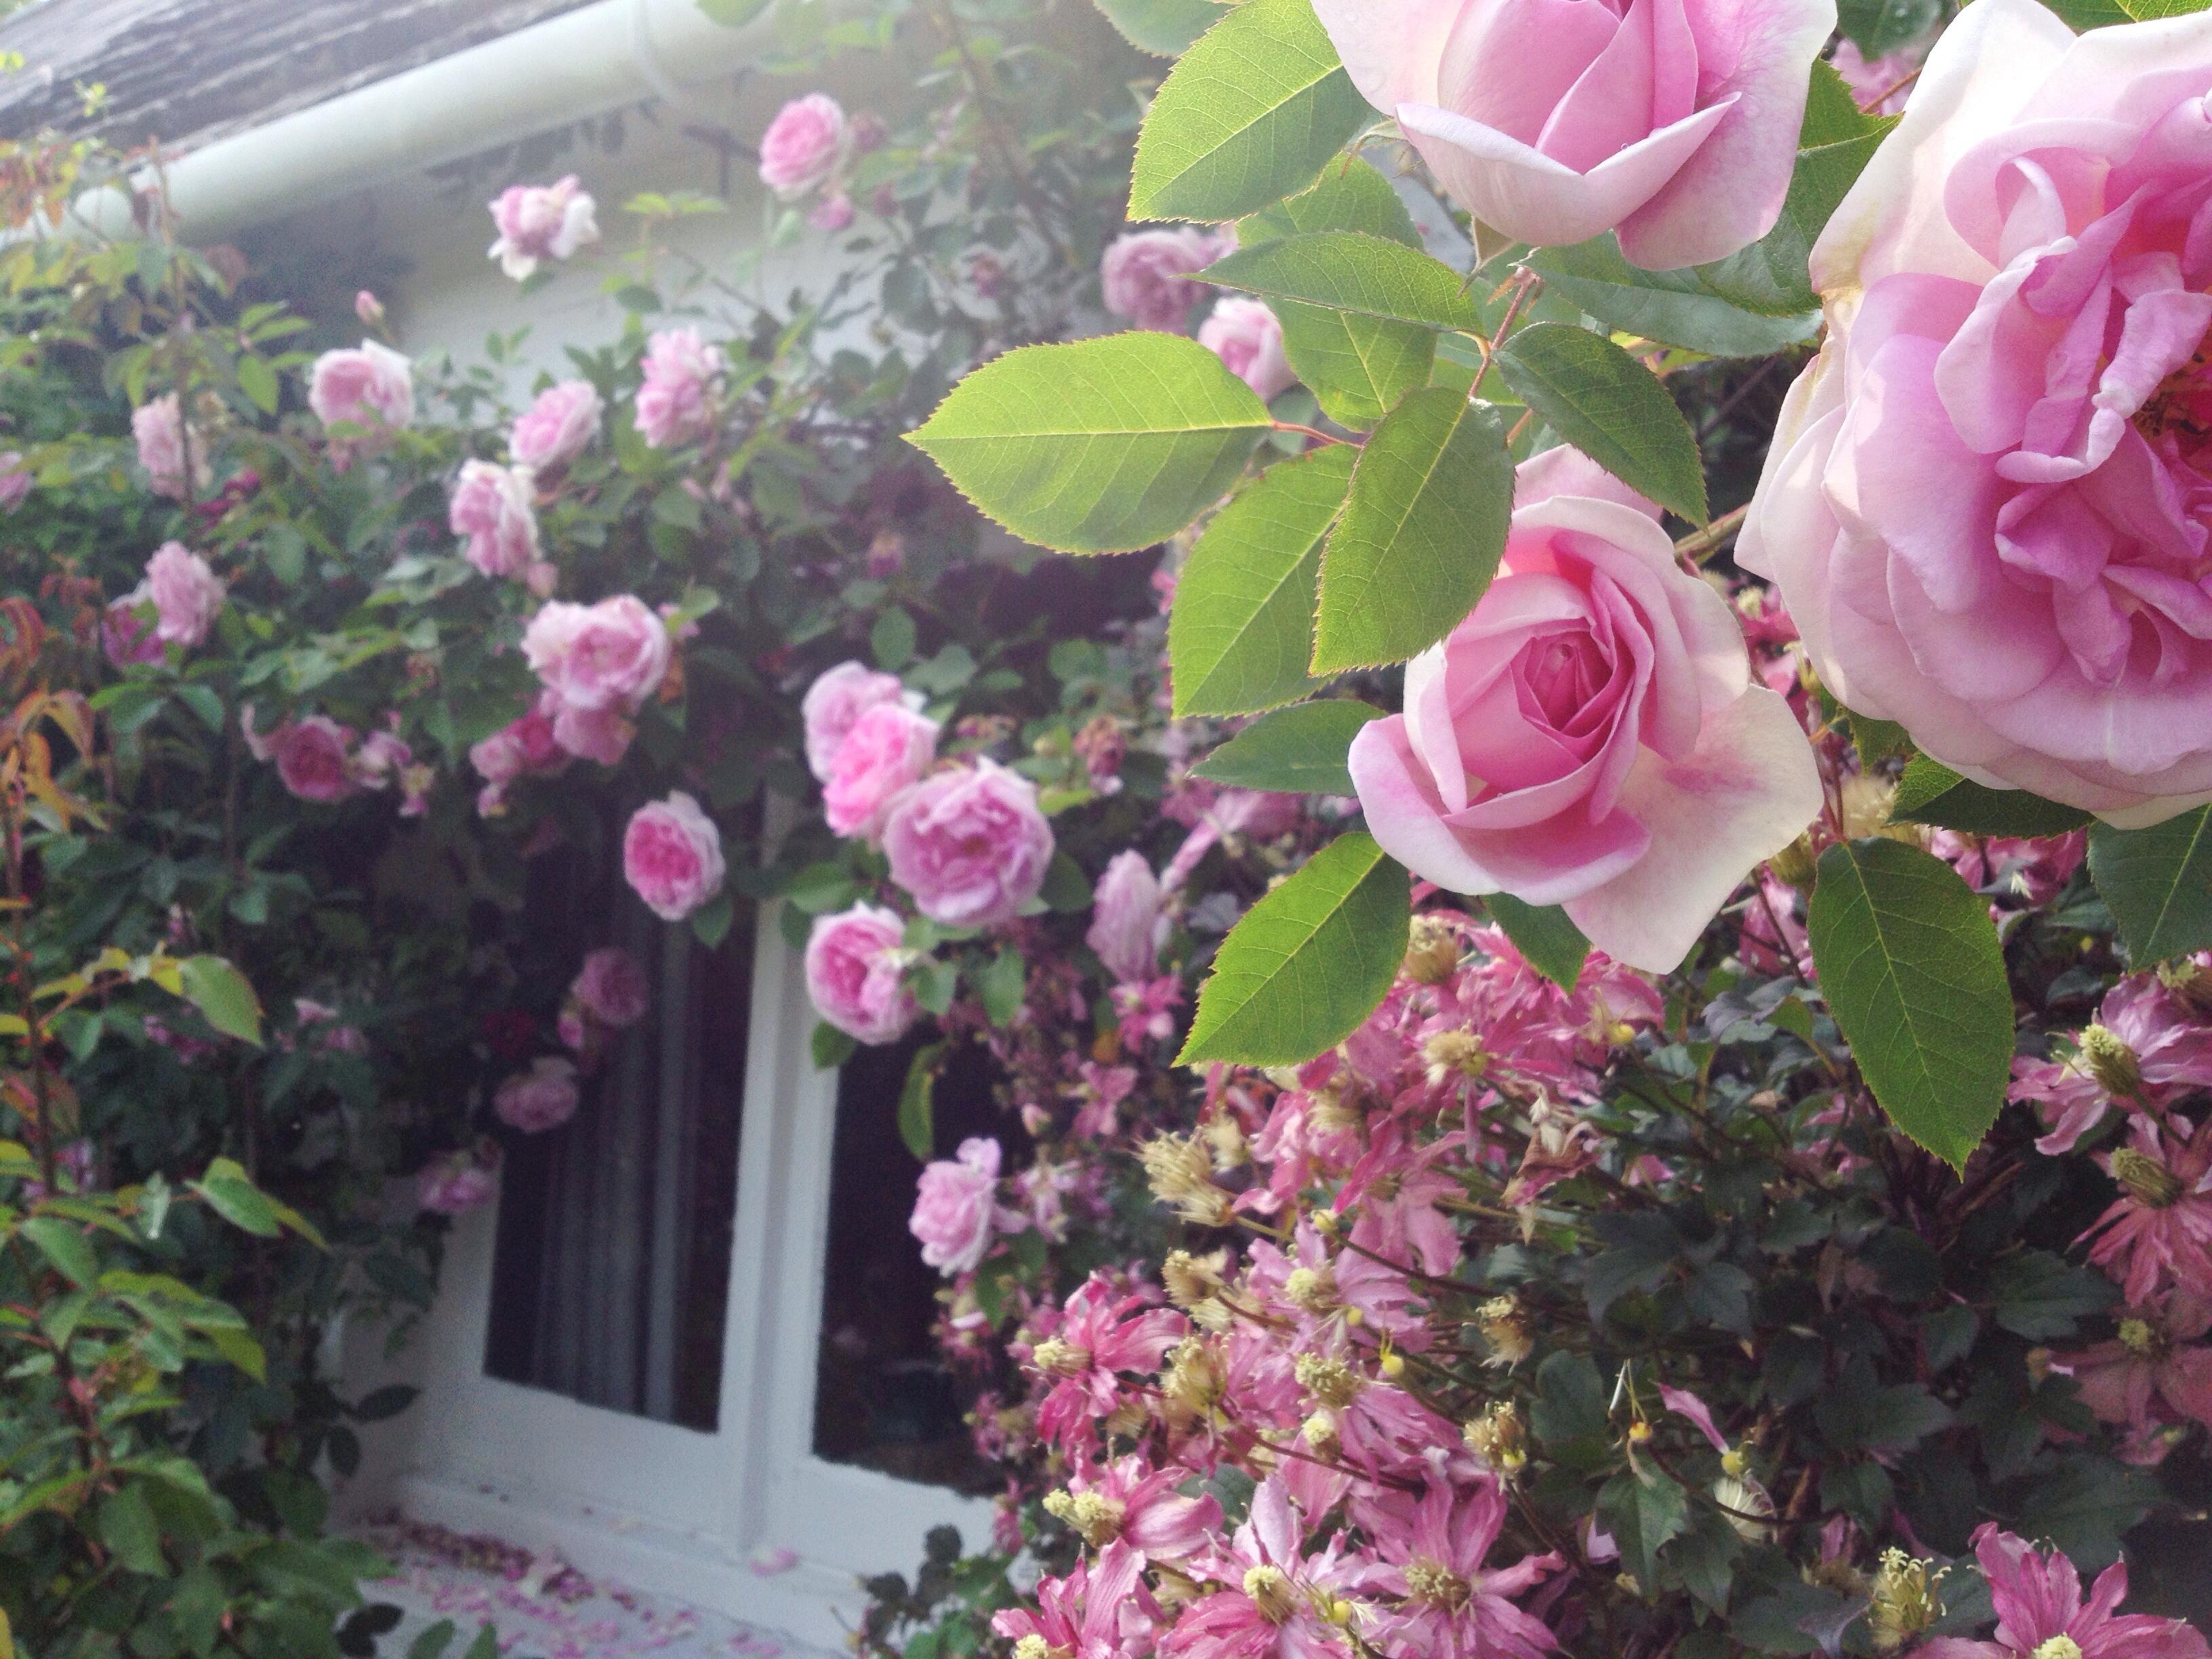 Maison Au Fond Du Jardin Construire Une Jolie Cabane De Jardin